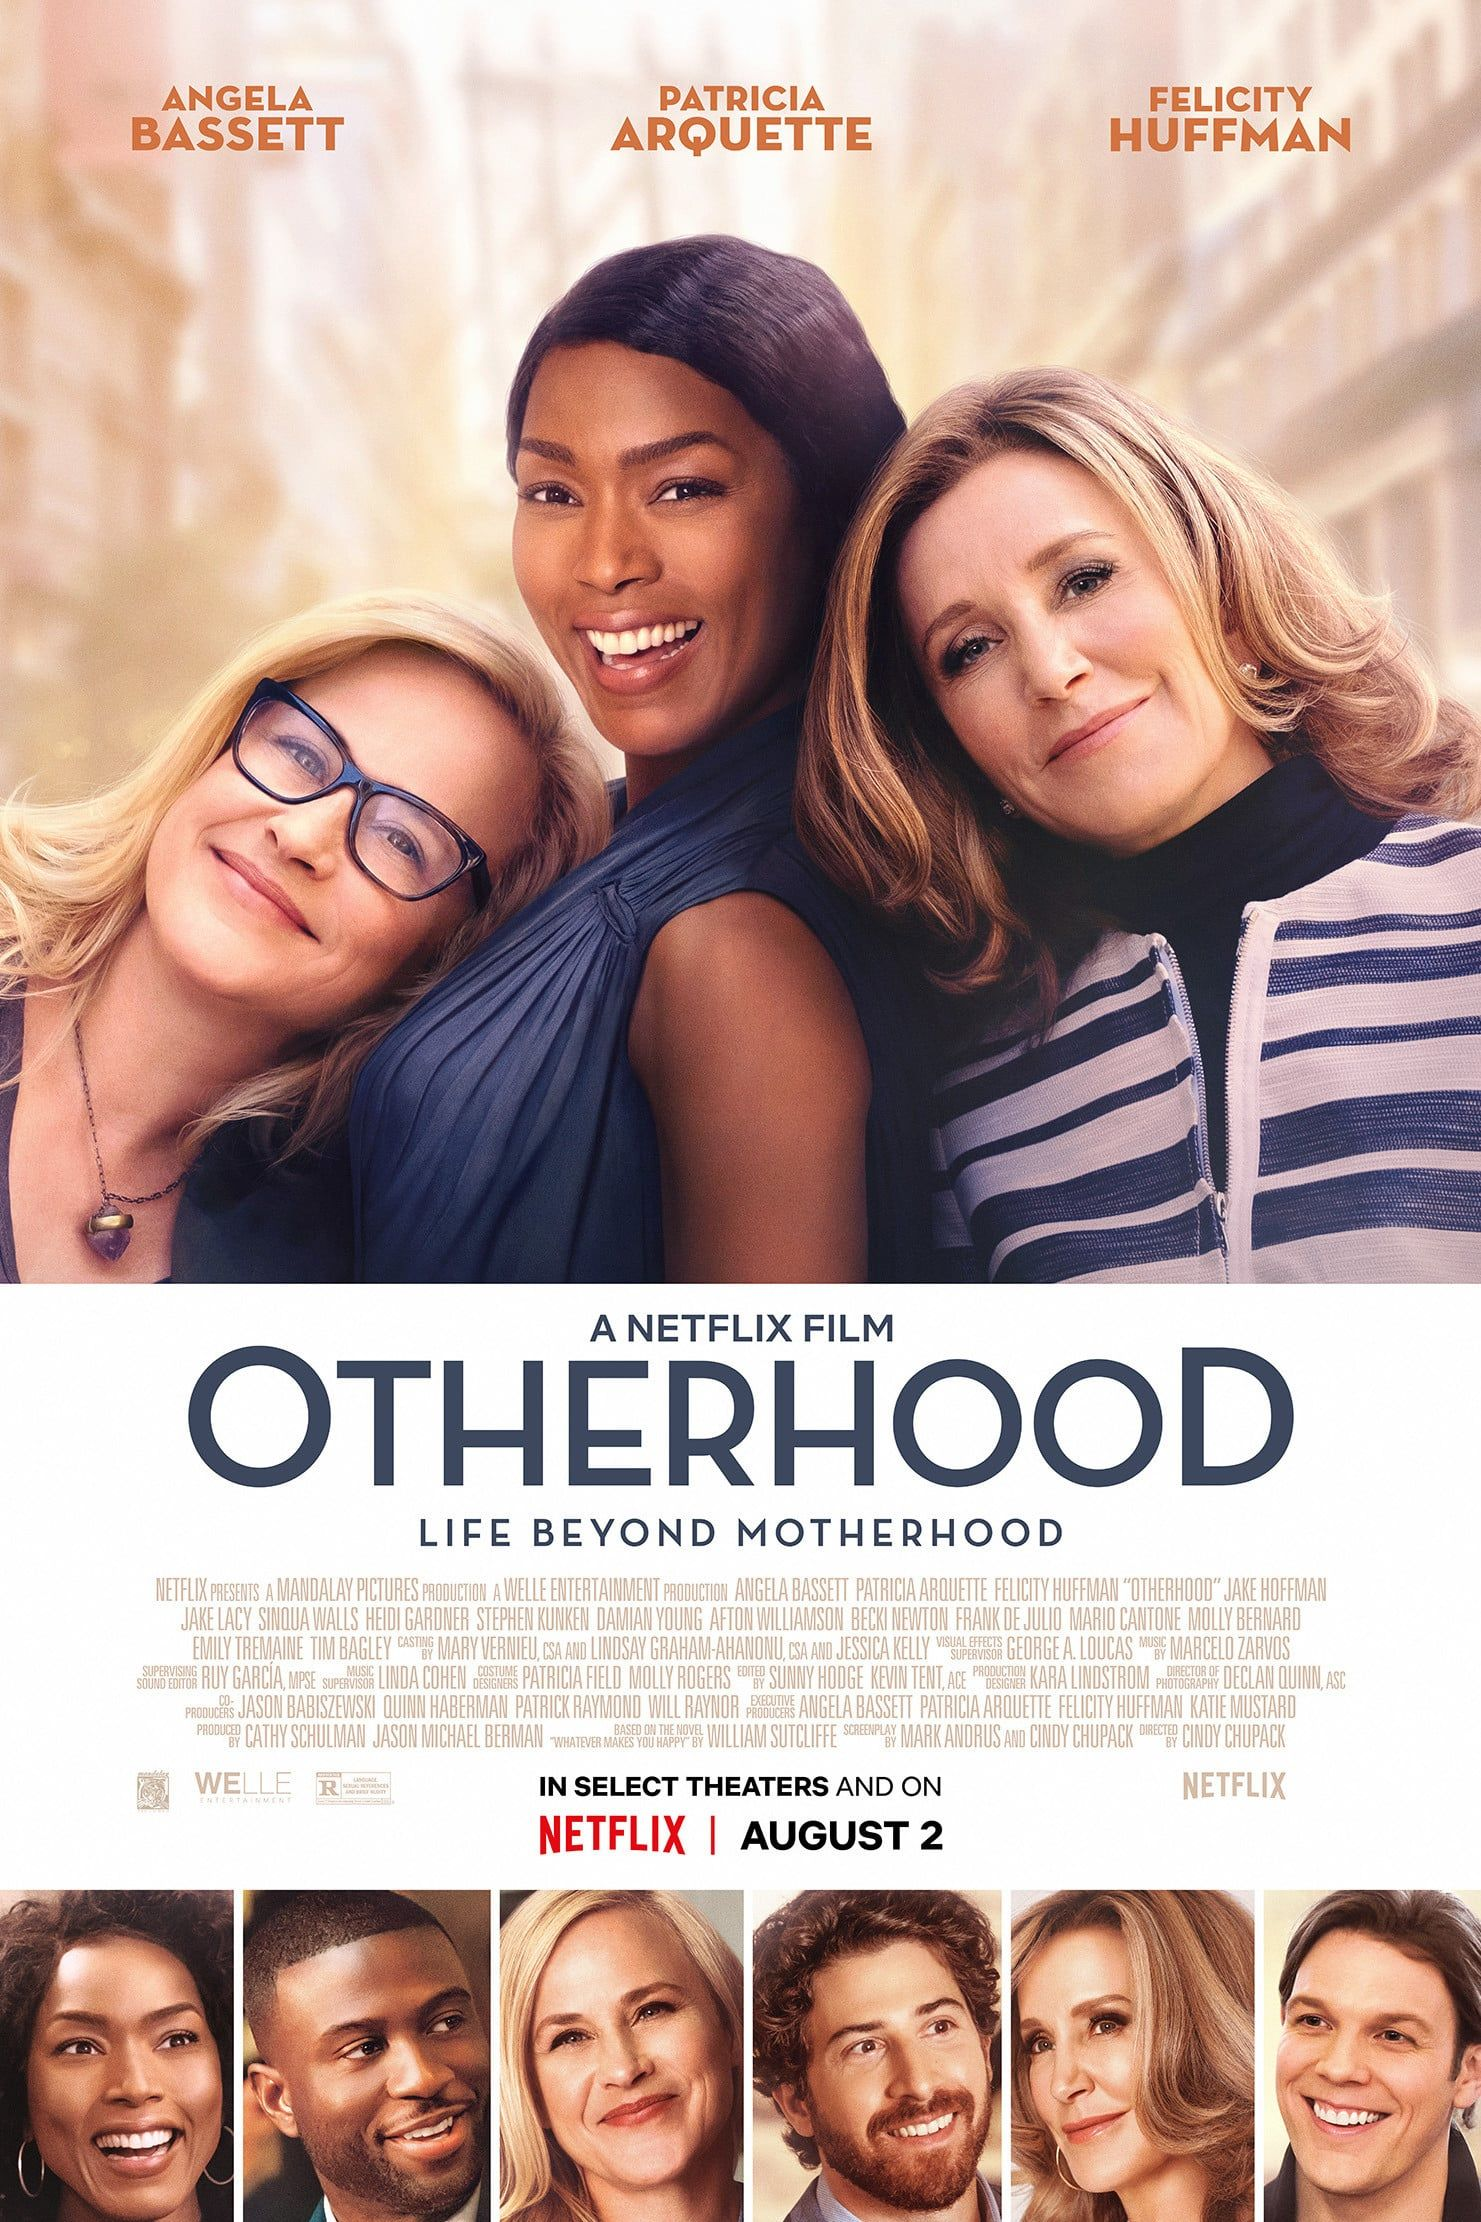 Otherhood 2019 Full Movie Online Free English Hd 720p 1080p Otherhood Fullmovie Fullmovieon Full Movies Online Free Free Movies Online Patricia Arquette